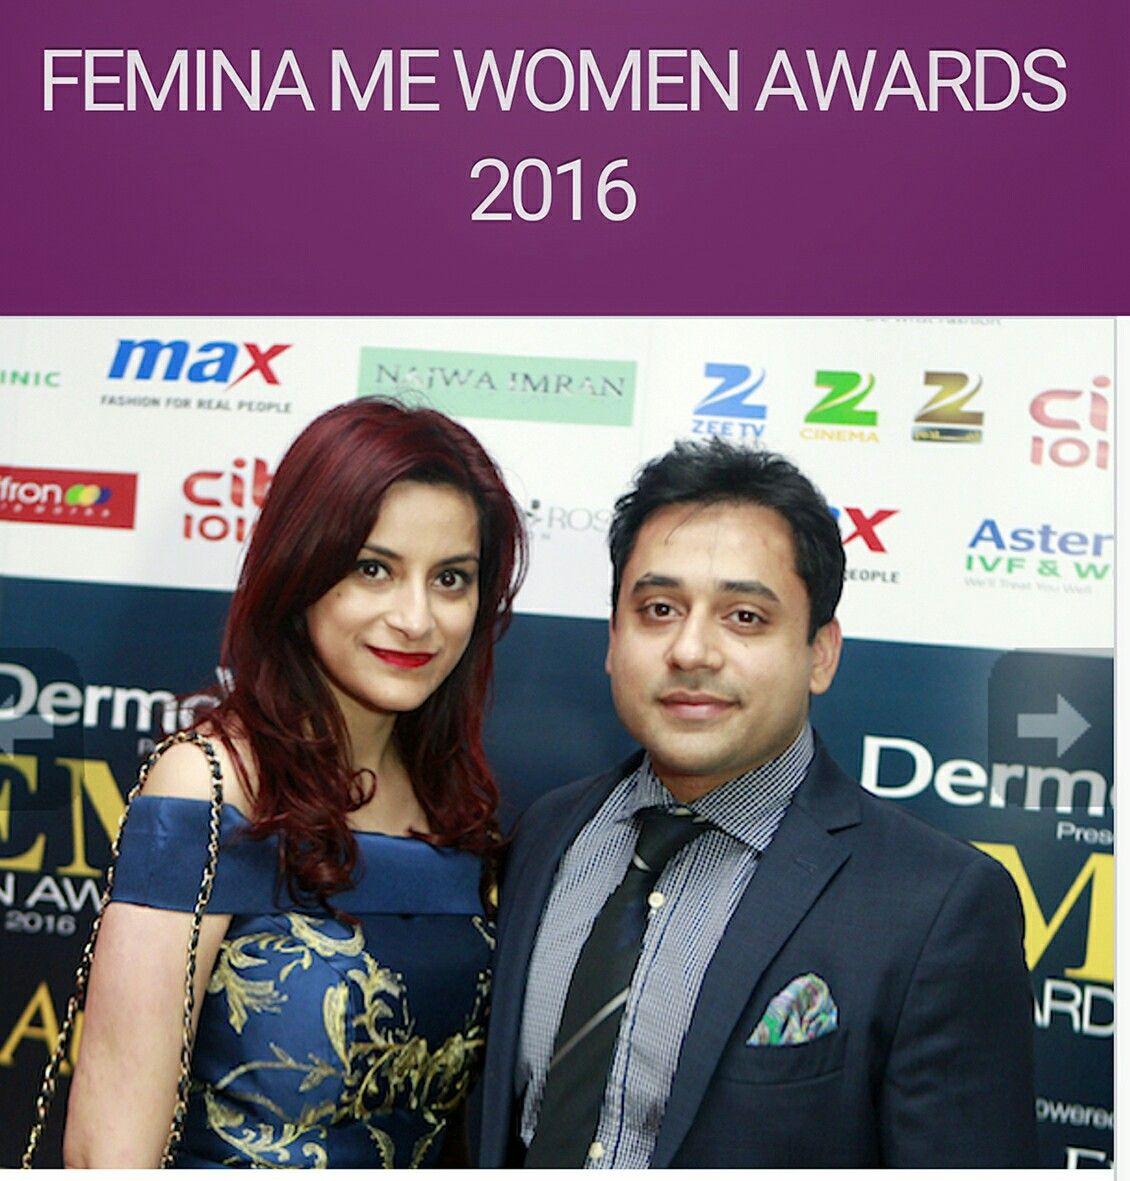 Salman Qureshi And Sara Japanwalla At The Femina Me Women Awards 2016 Stand Up Comedians Comedians Top Comedians